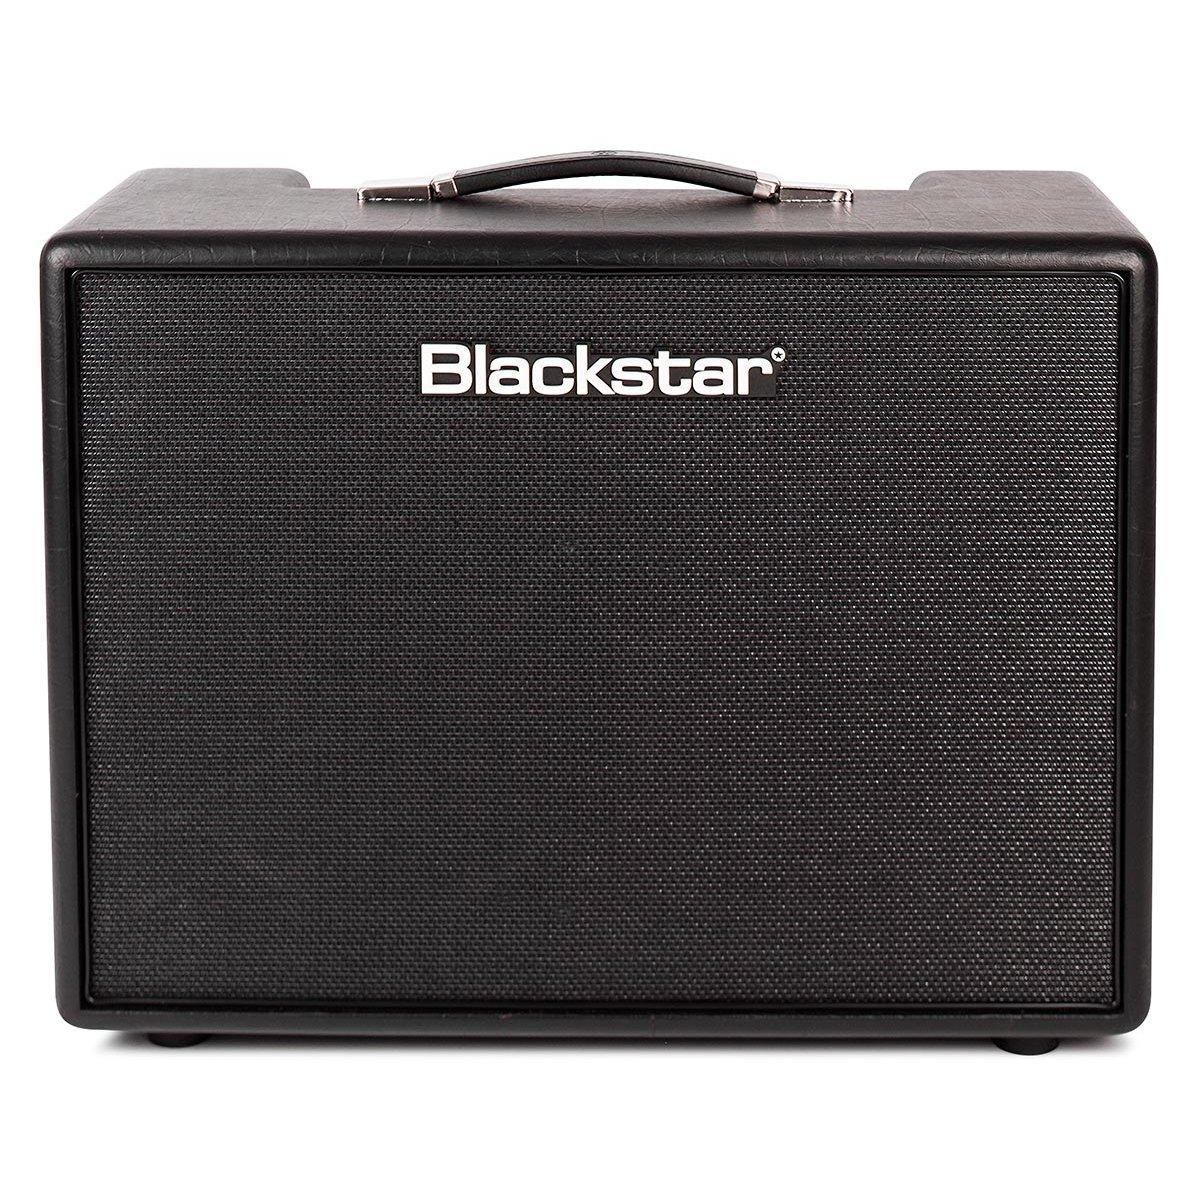 "Blackstar ARTIST15 15W 1x12"" Tube Combo Amplifier"